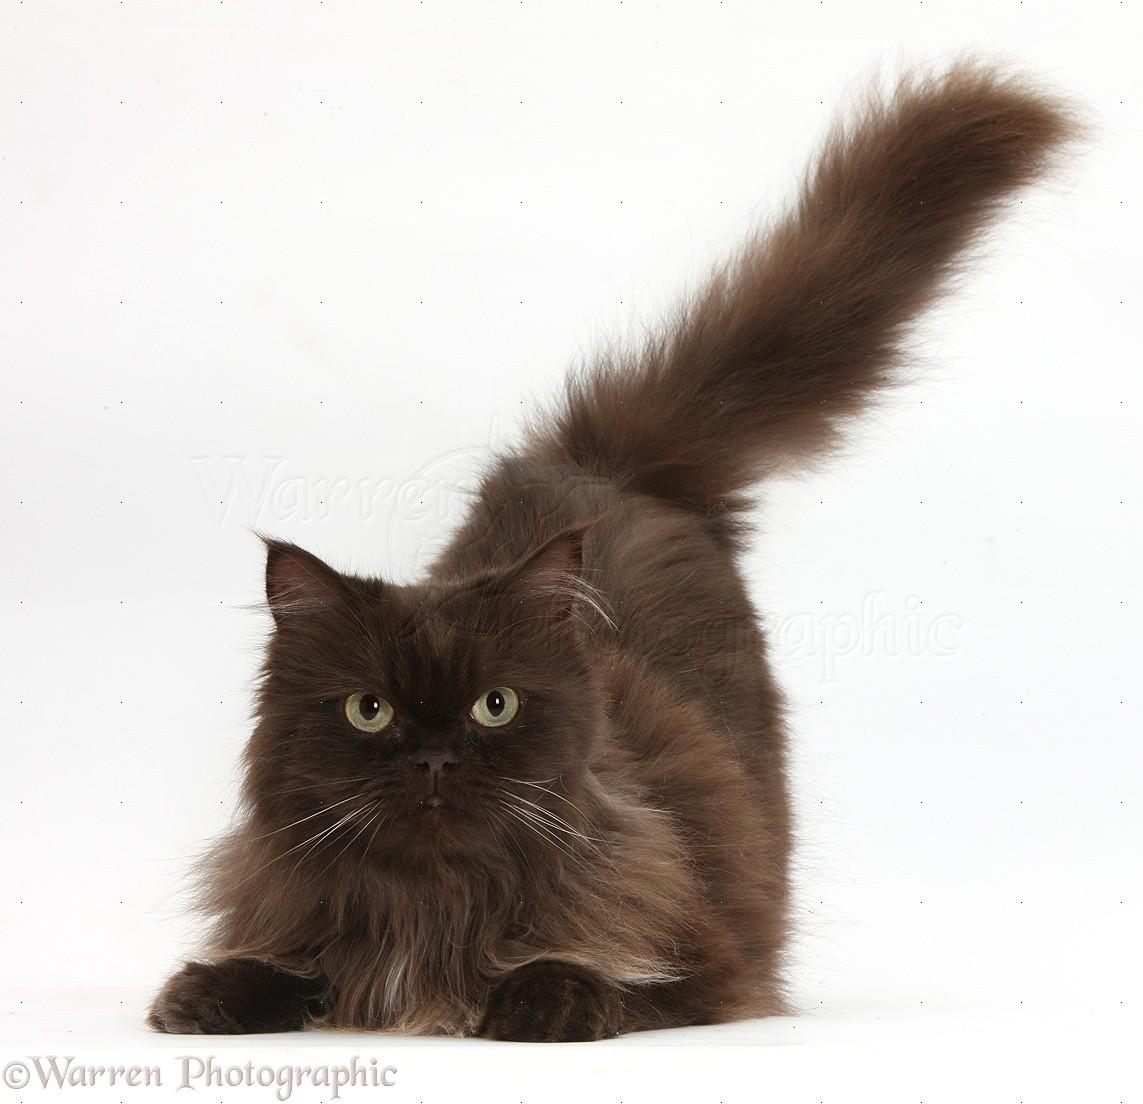 York Chocolate Cat Pictures